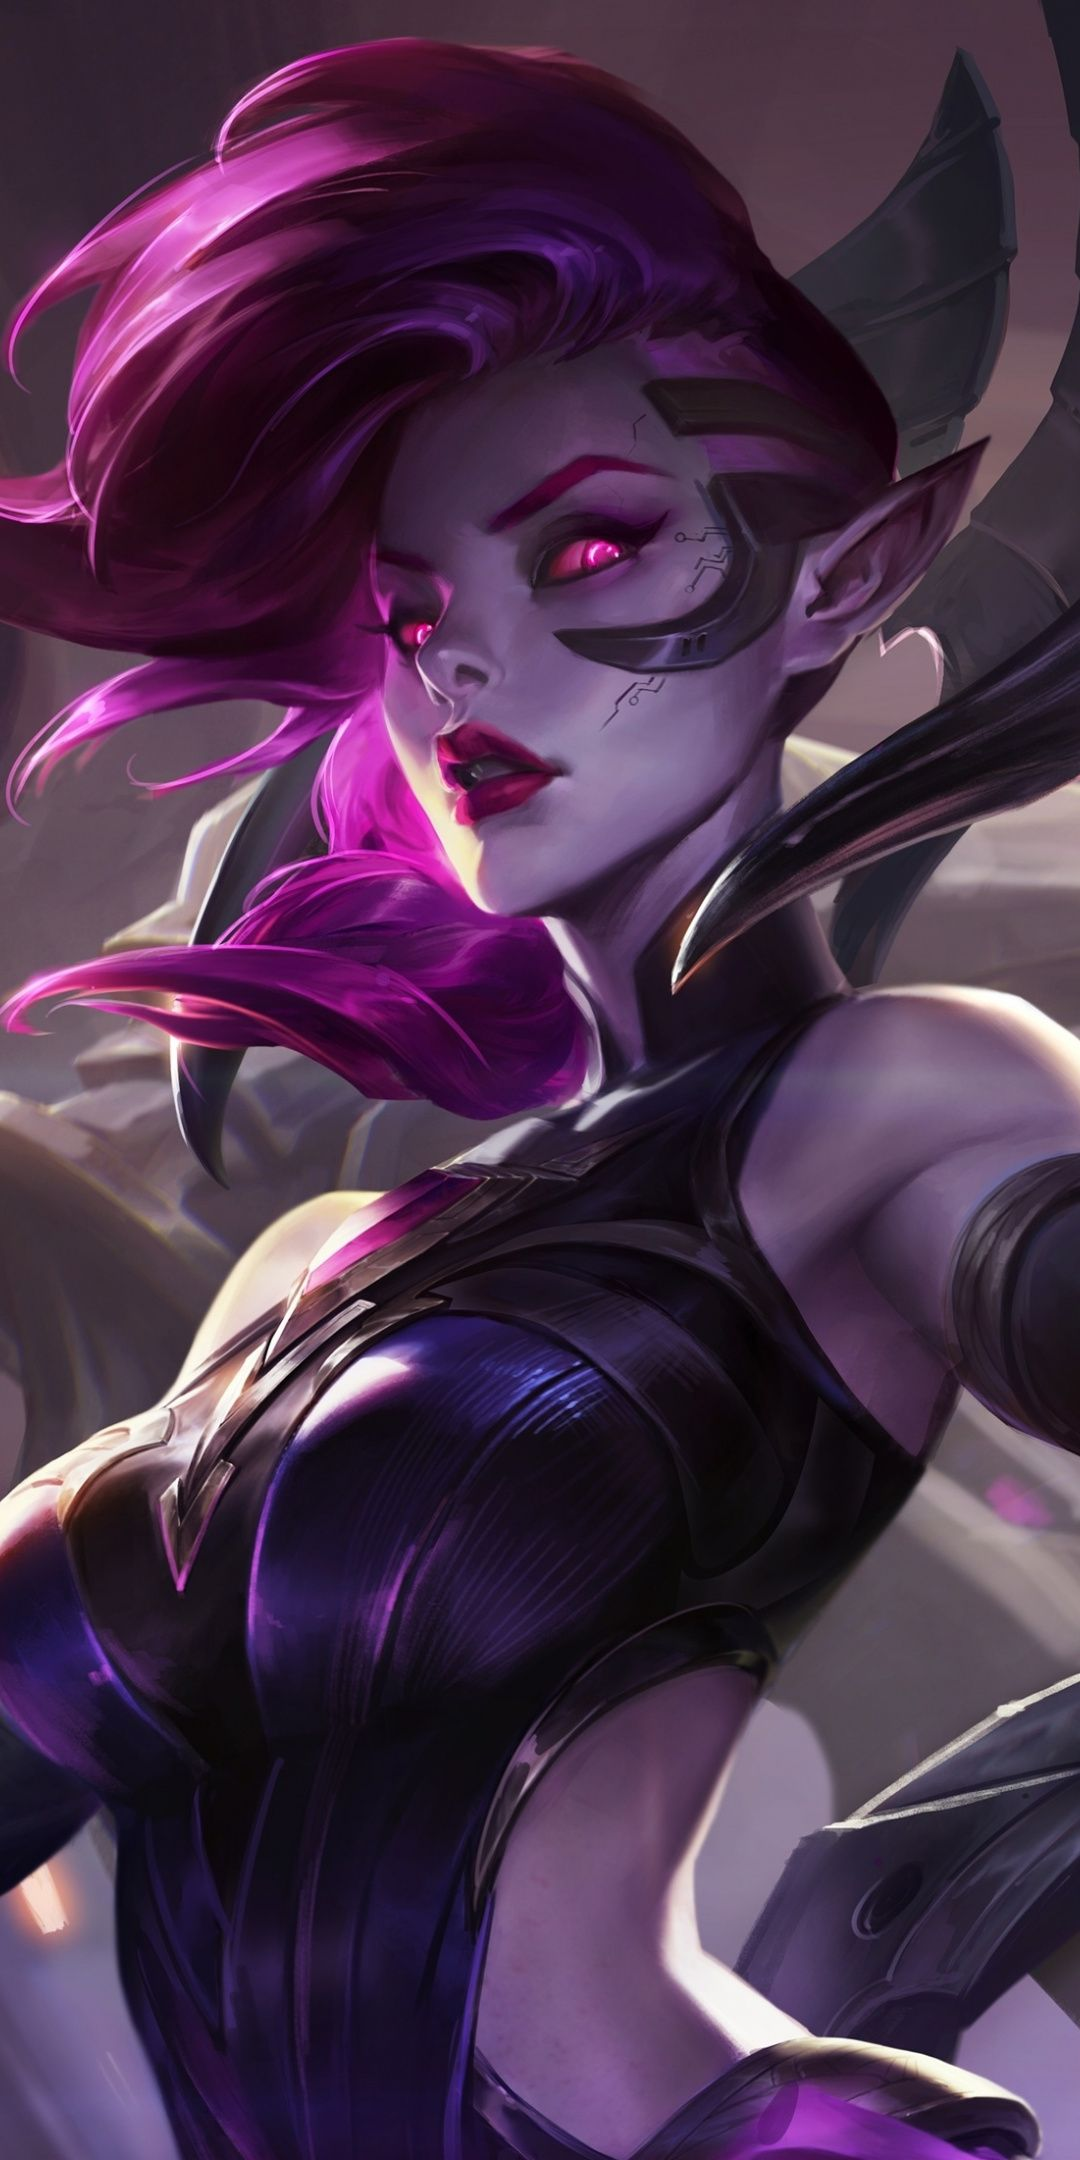 Morgana League Of Legends Violet Hair Video Game 1080x2160 Wallpaper Lol League Of Legends League Of Legends Characters League Of Legends